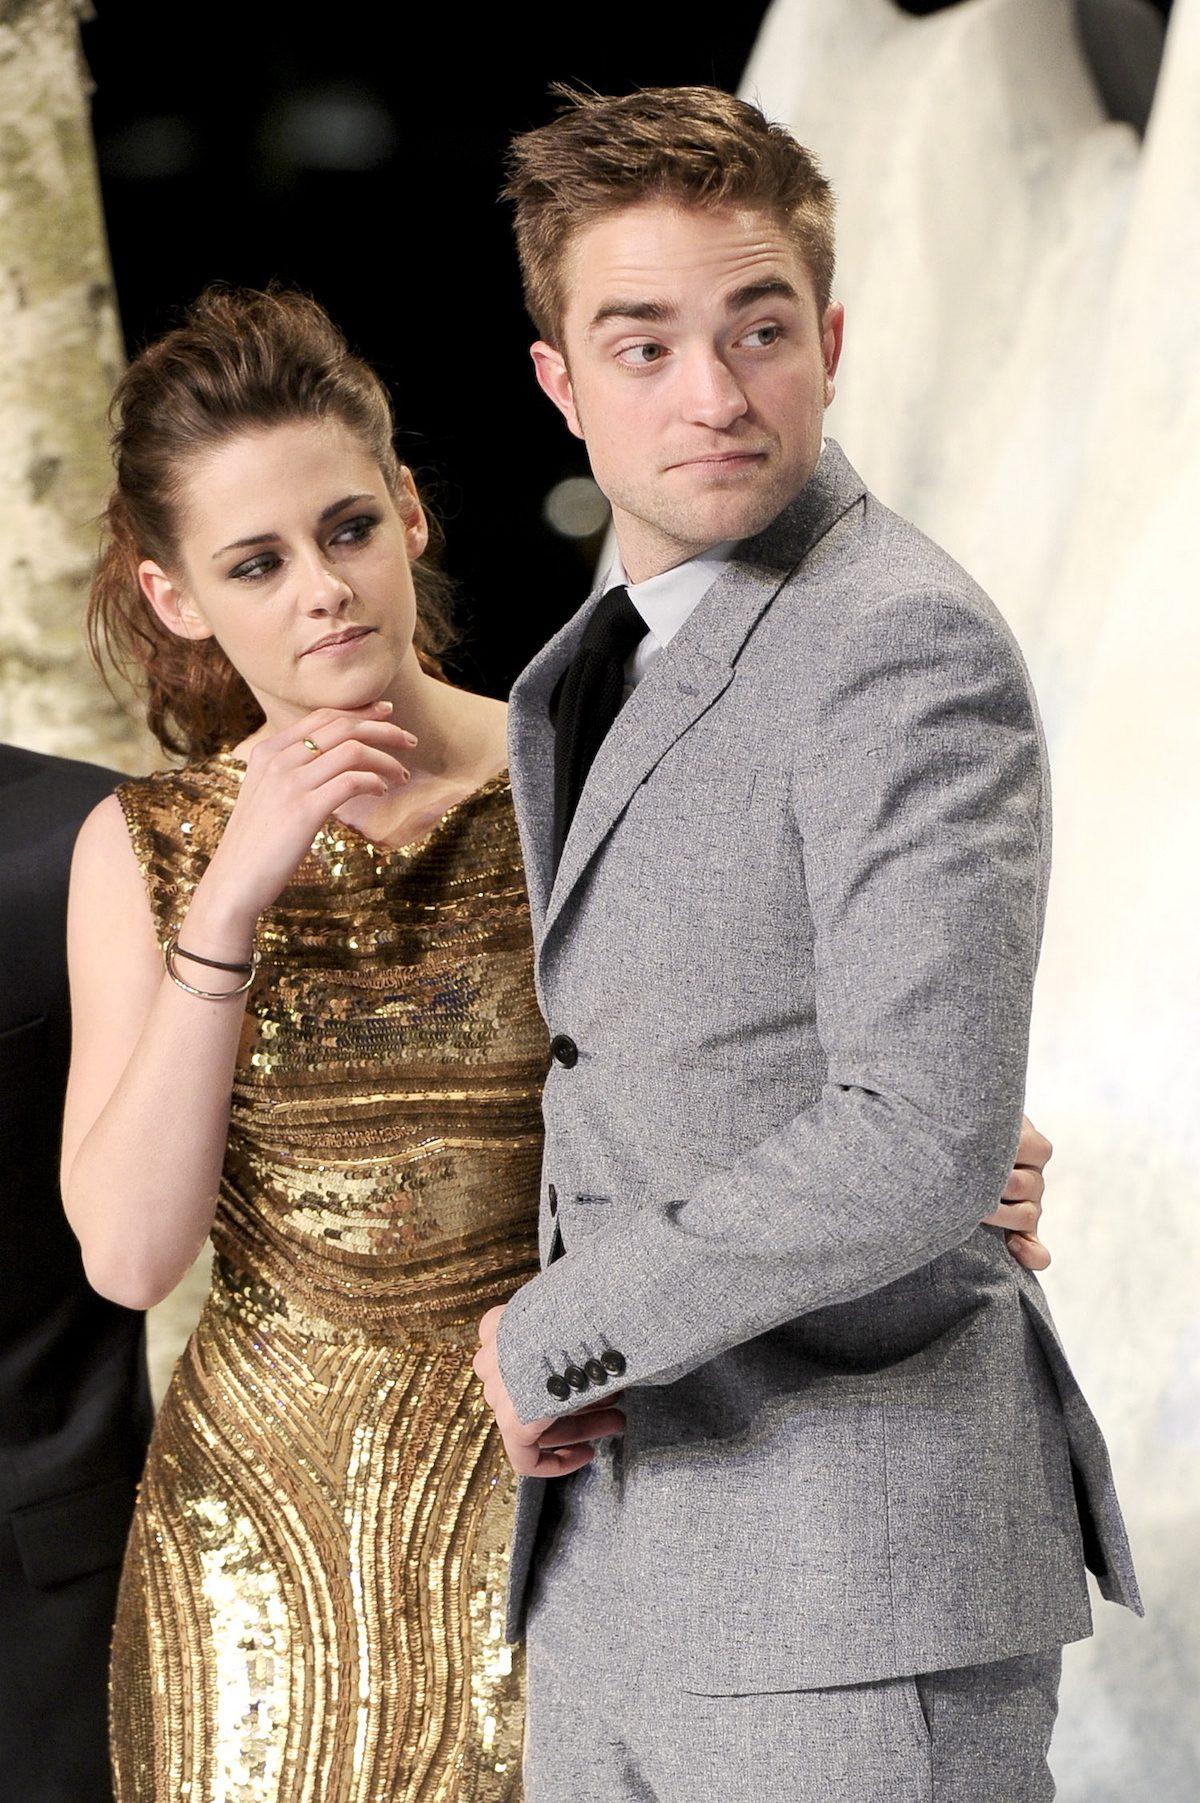 Kristen Stewart Reflects On Her Relationship With Robert Pattinson — 'So Much Was Taken From Us